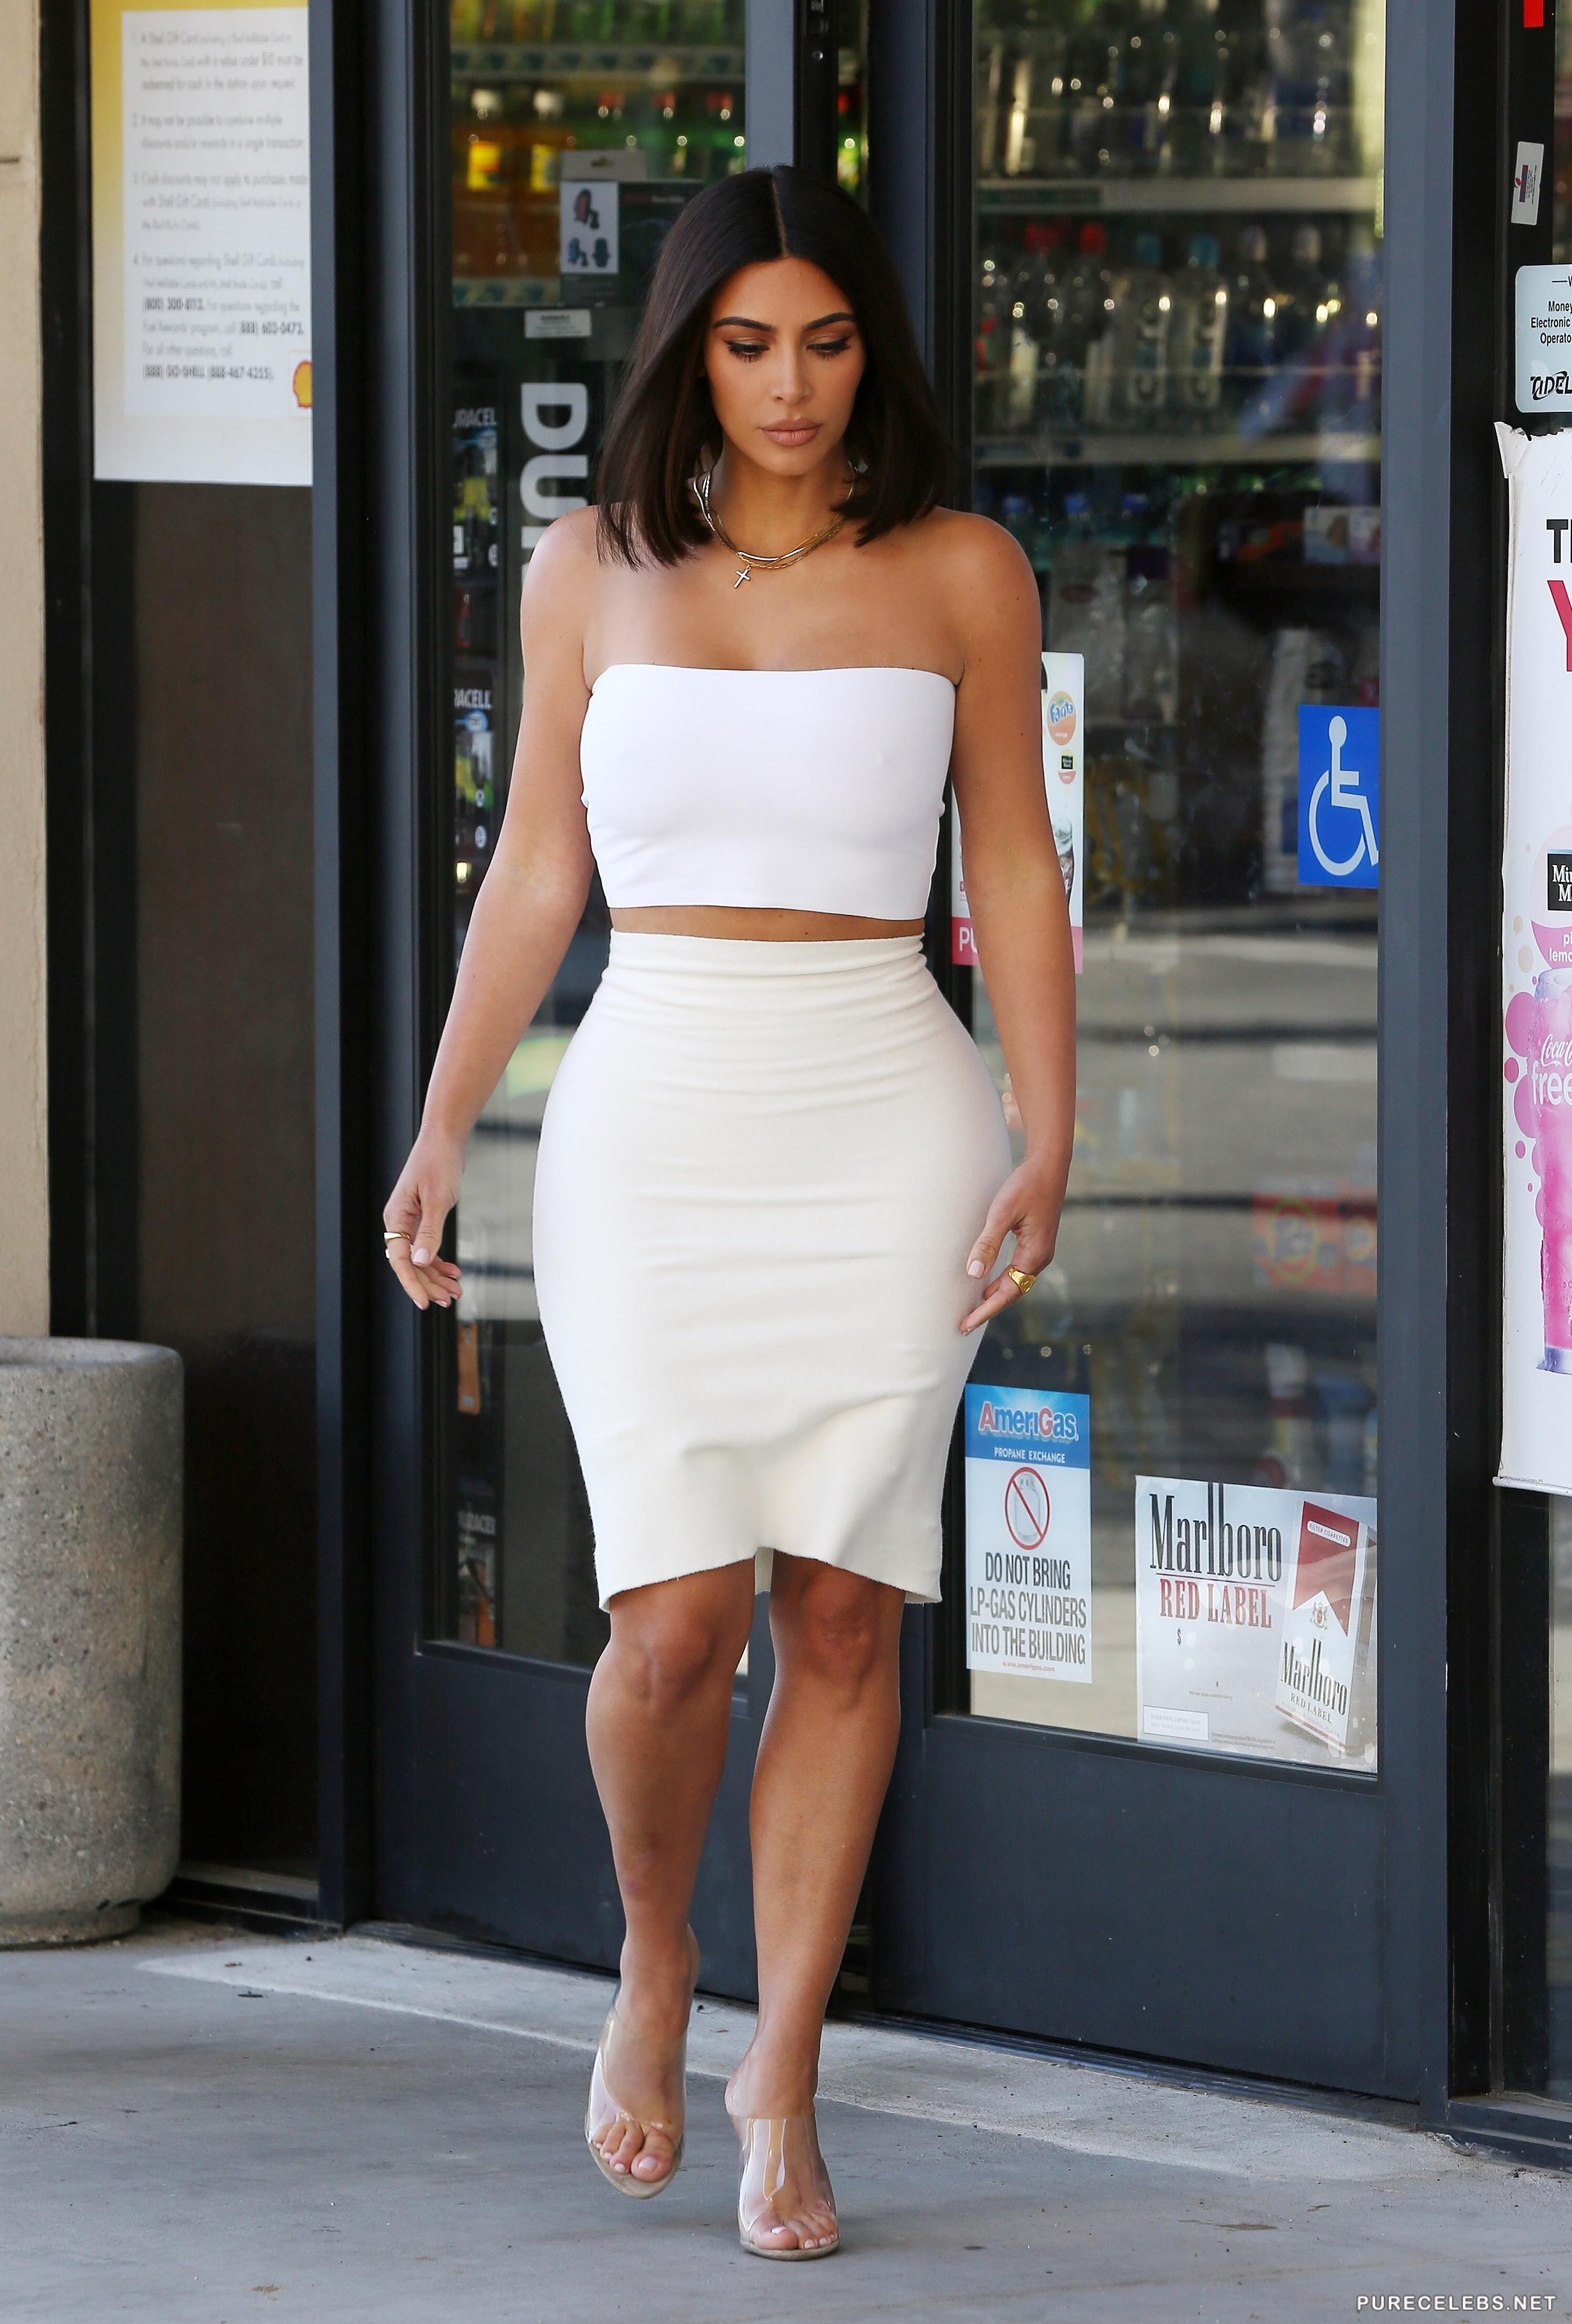 Kim Kardashian Paparazzi Braless Photos - NuCelebs.com